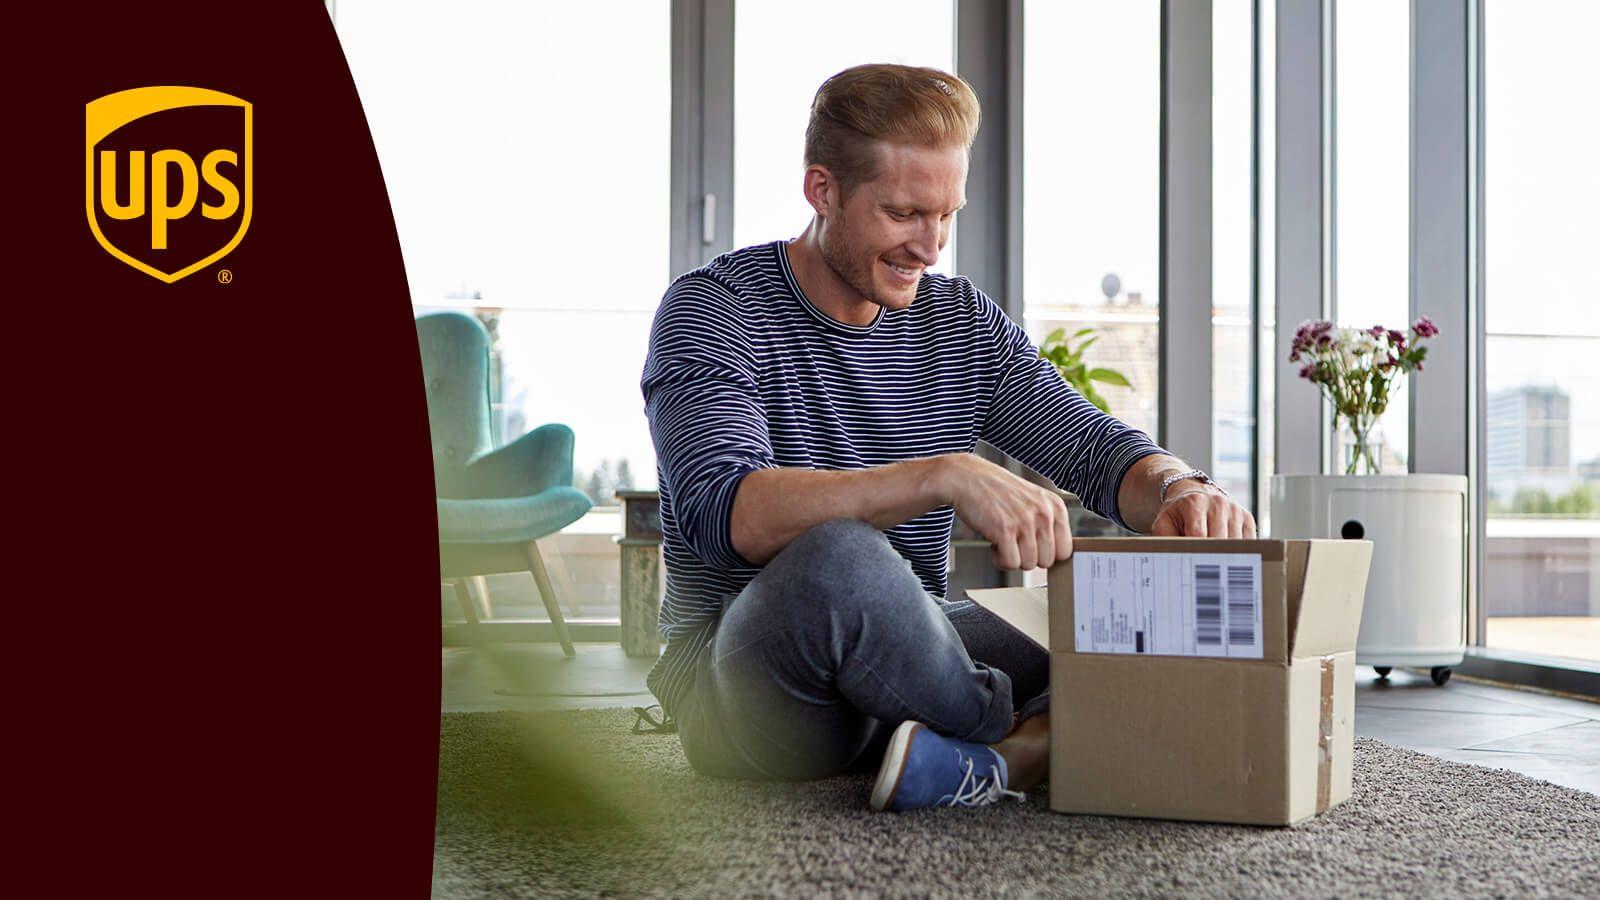 New UPS® Shipping Options for Easyship Merchants to Save Big